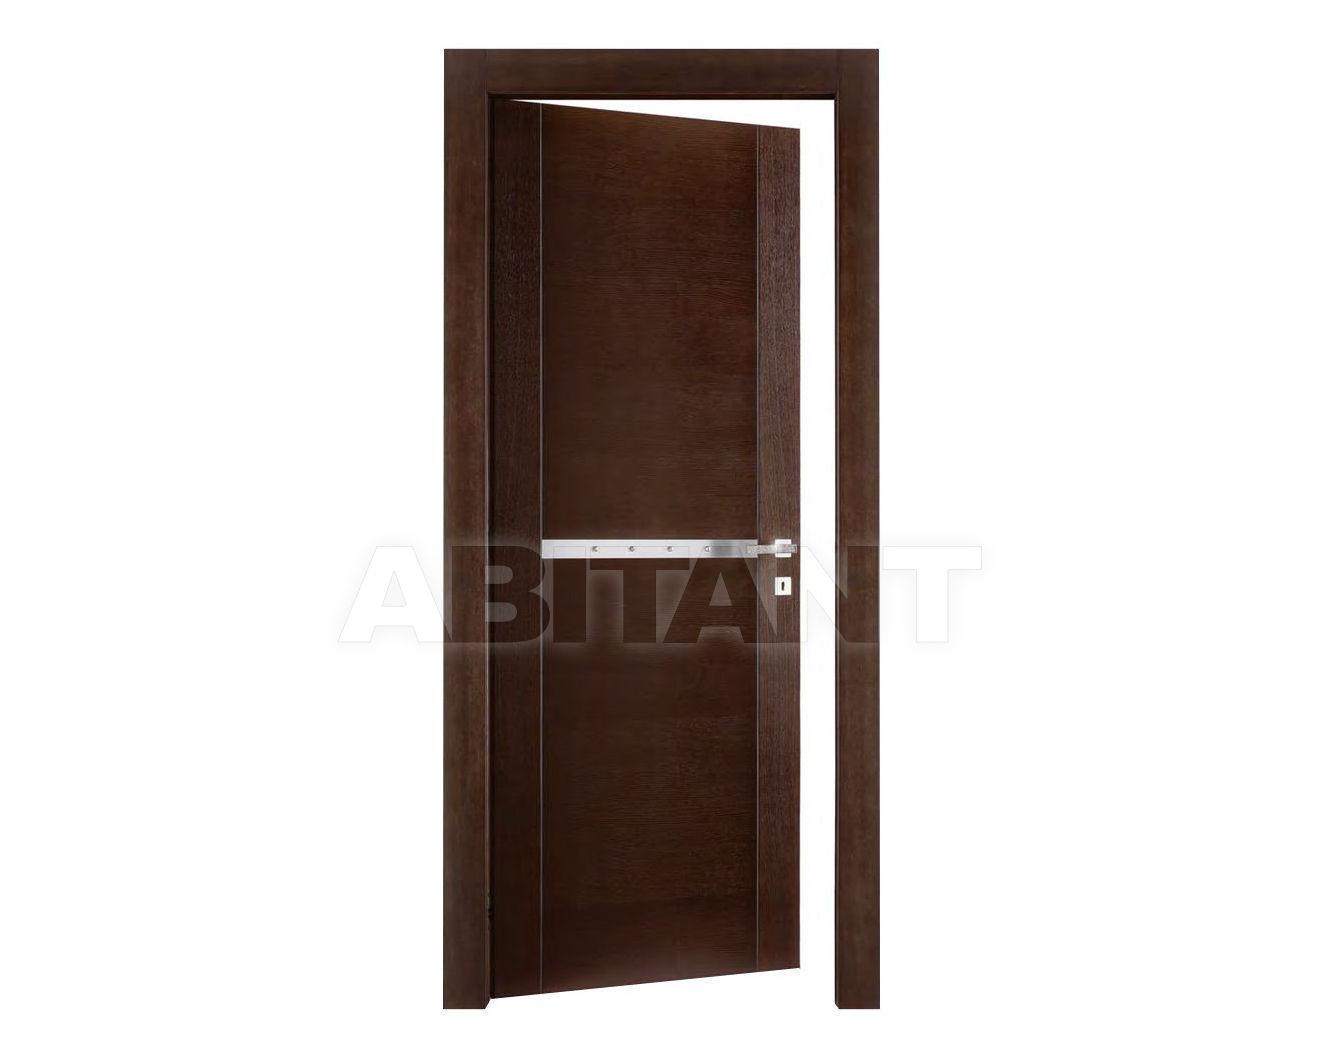 Купить Дверь деревянная Fioravazzi Modulo S45 TRATTO A CRIStALLIZEd